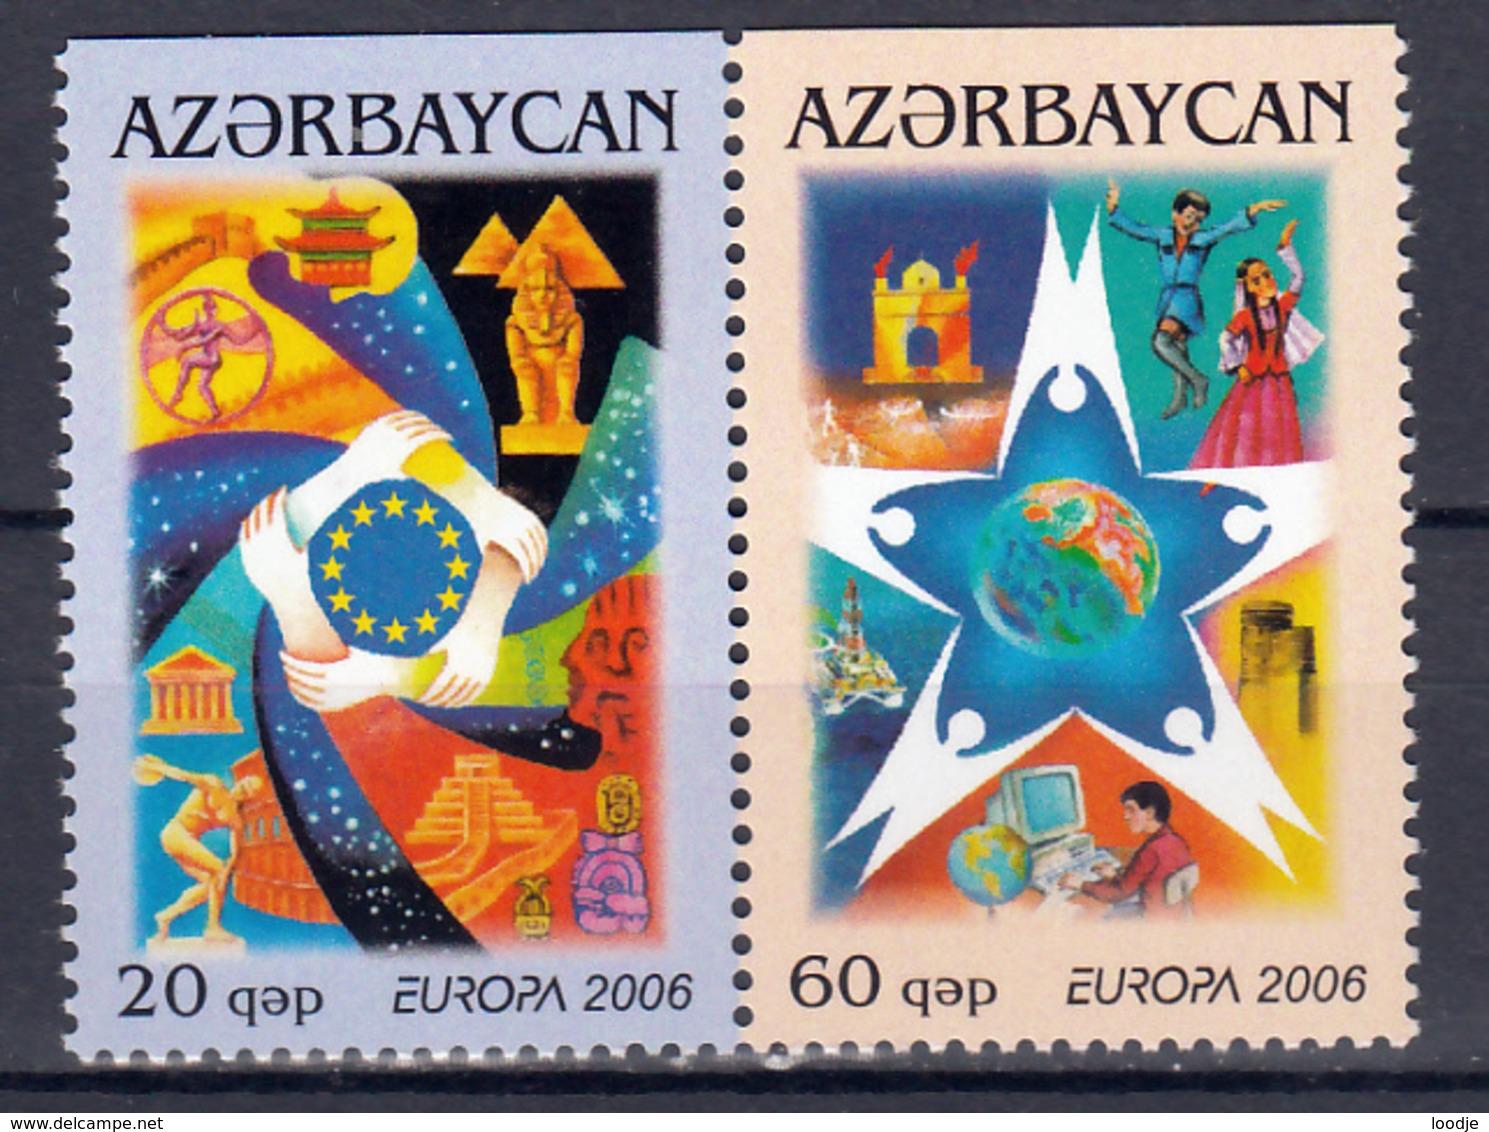 Aserbeidzjan  Europa Cept 2006 Type D  Paar  Postfris M.N.H. - Europa-CEPT